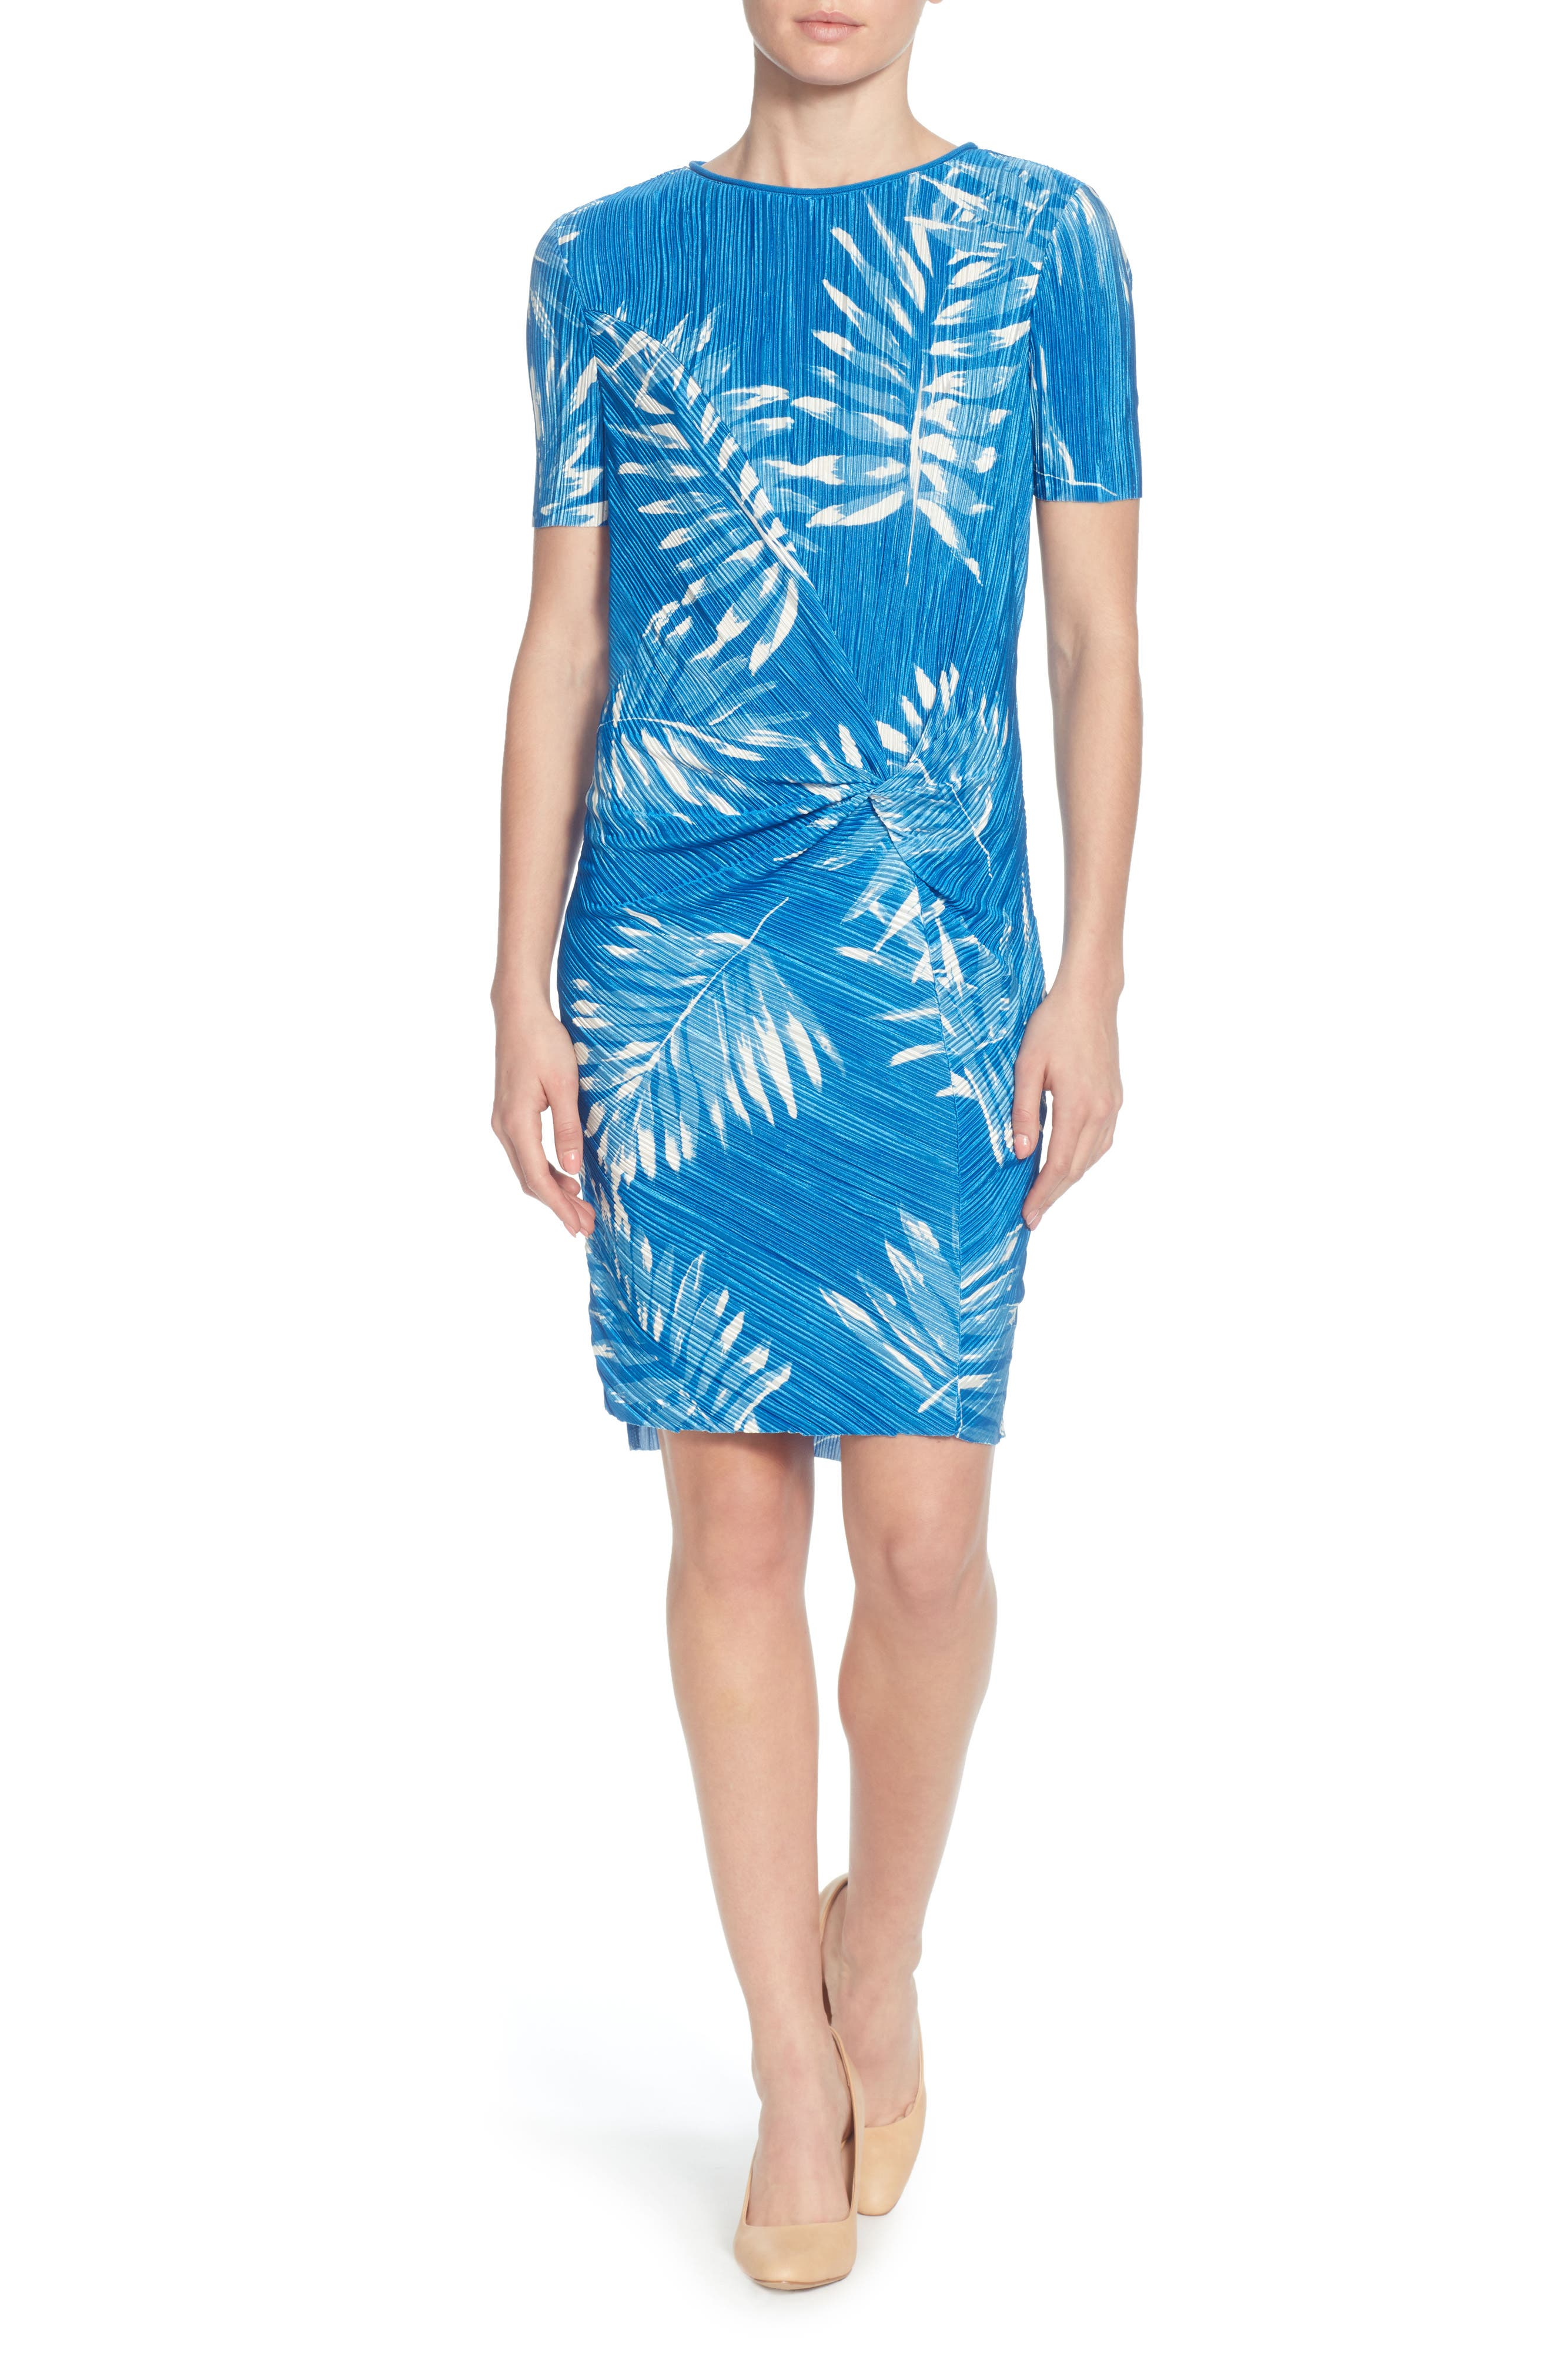 Catherine Malandrino Dina Micropleat Dress Blue